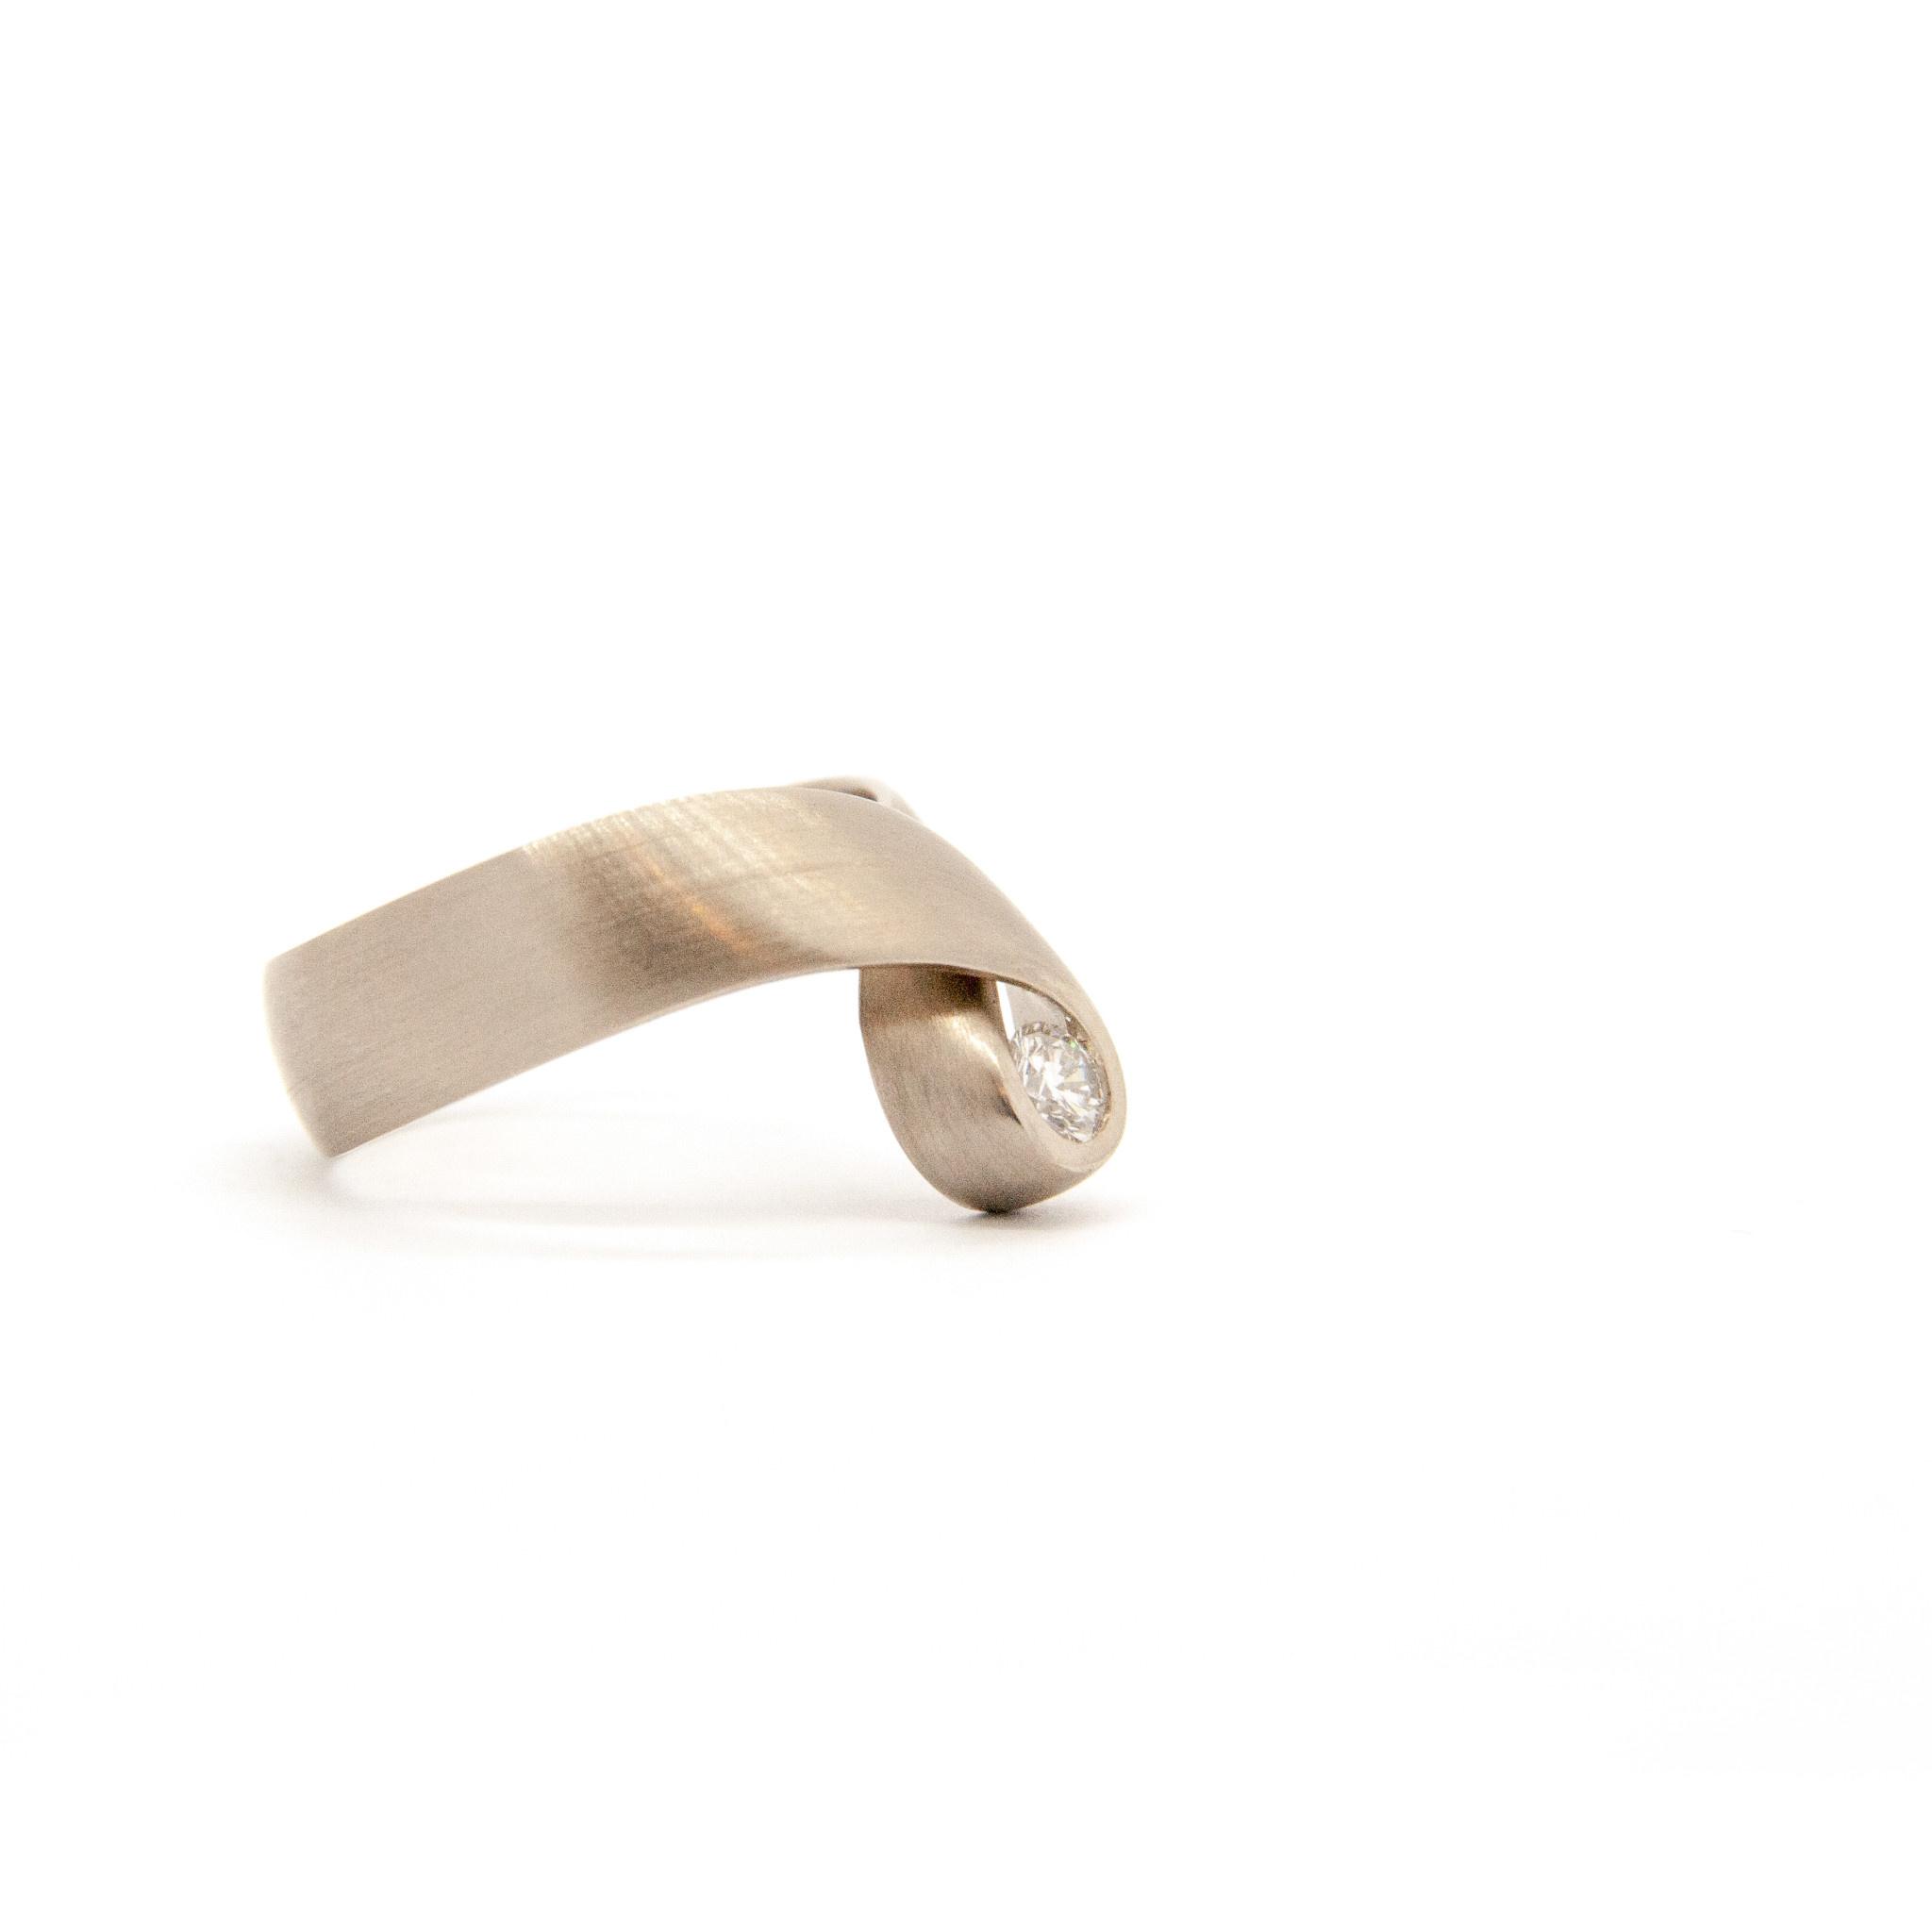 14k white gold ring size 56-2